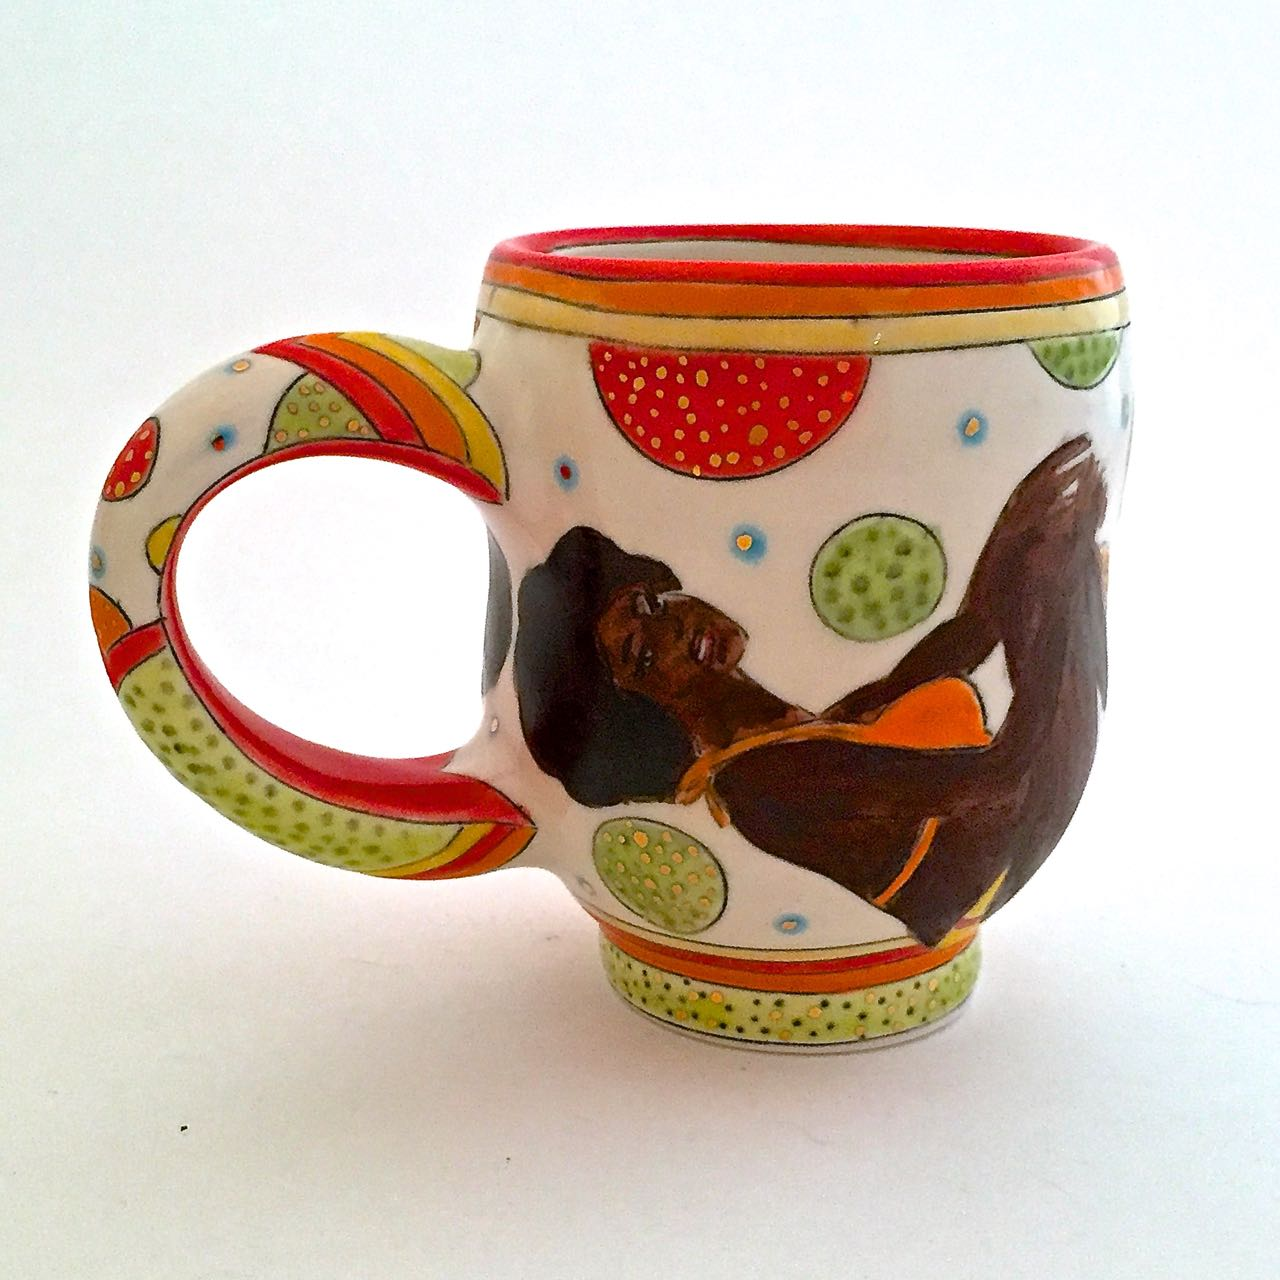 Image 4-Rink Queen Mug 1.jpg